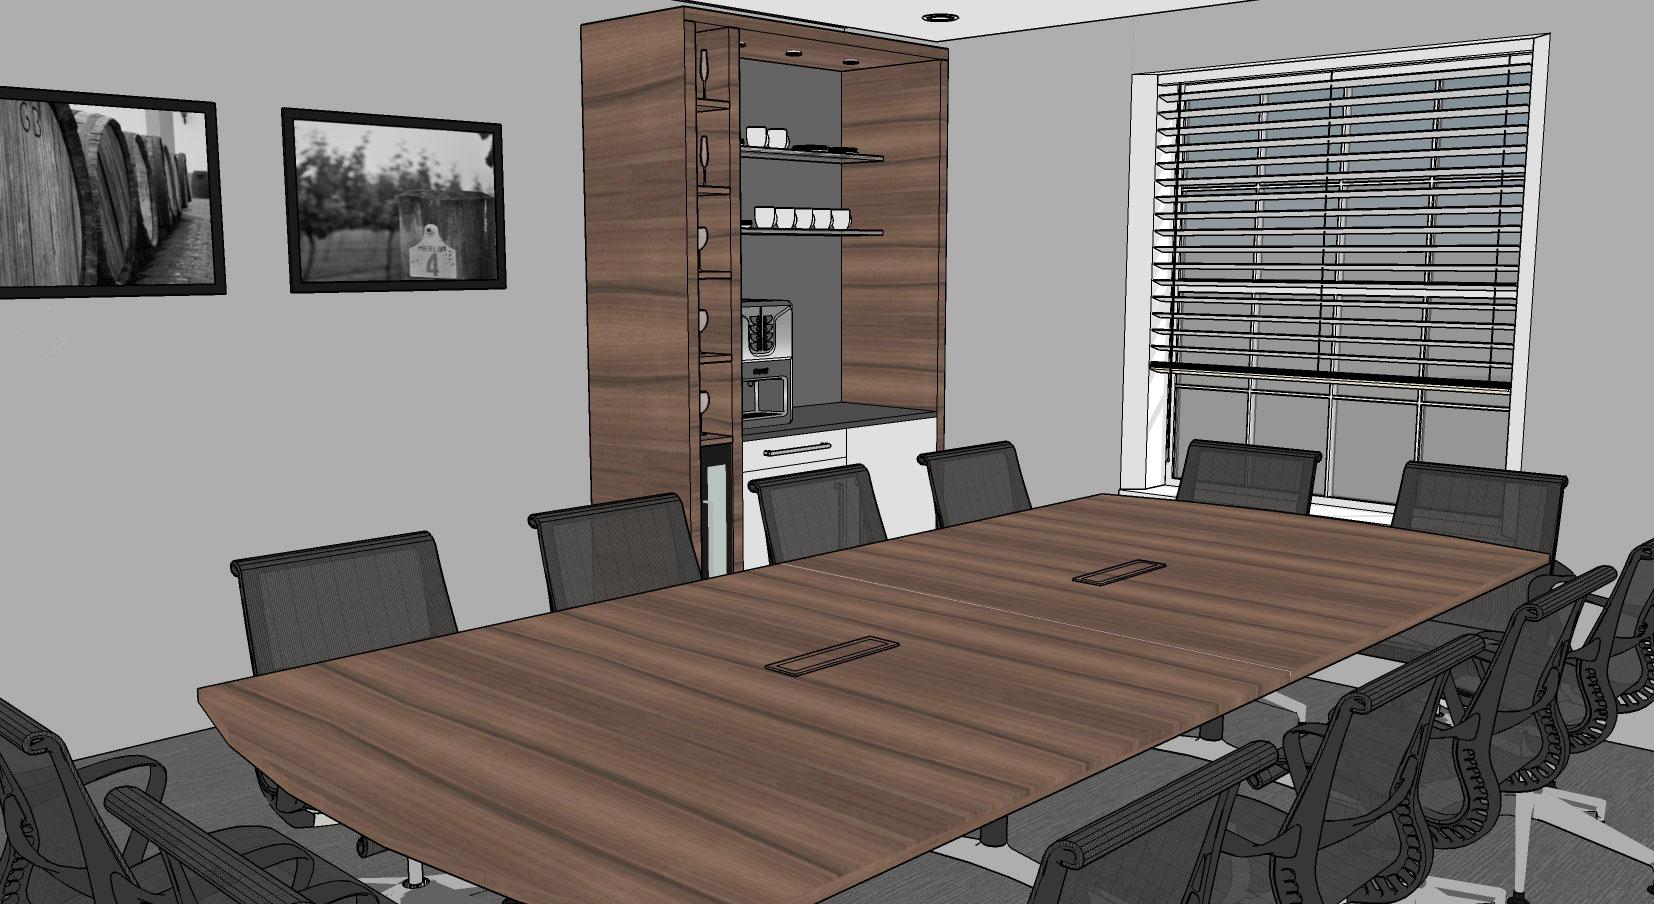 Broadland-Wineries-boardroom-desig